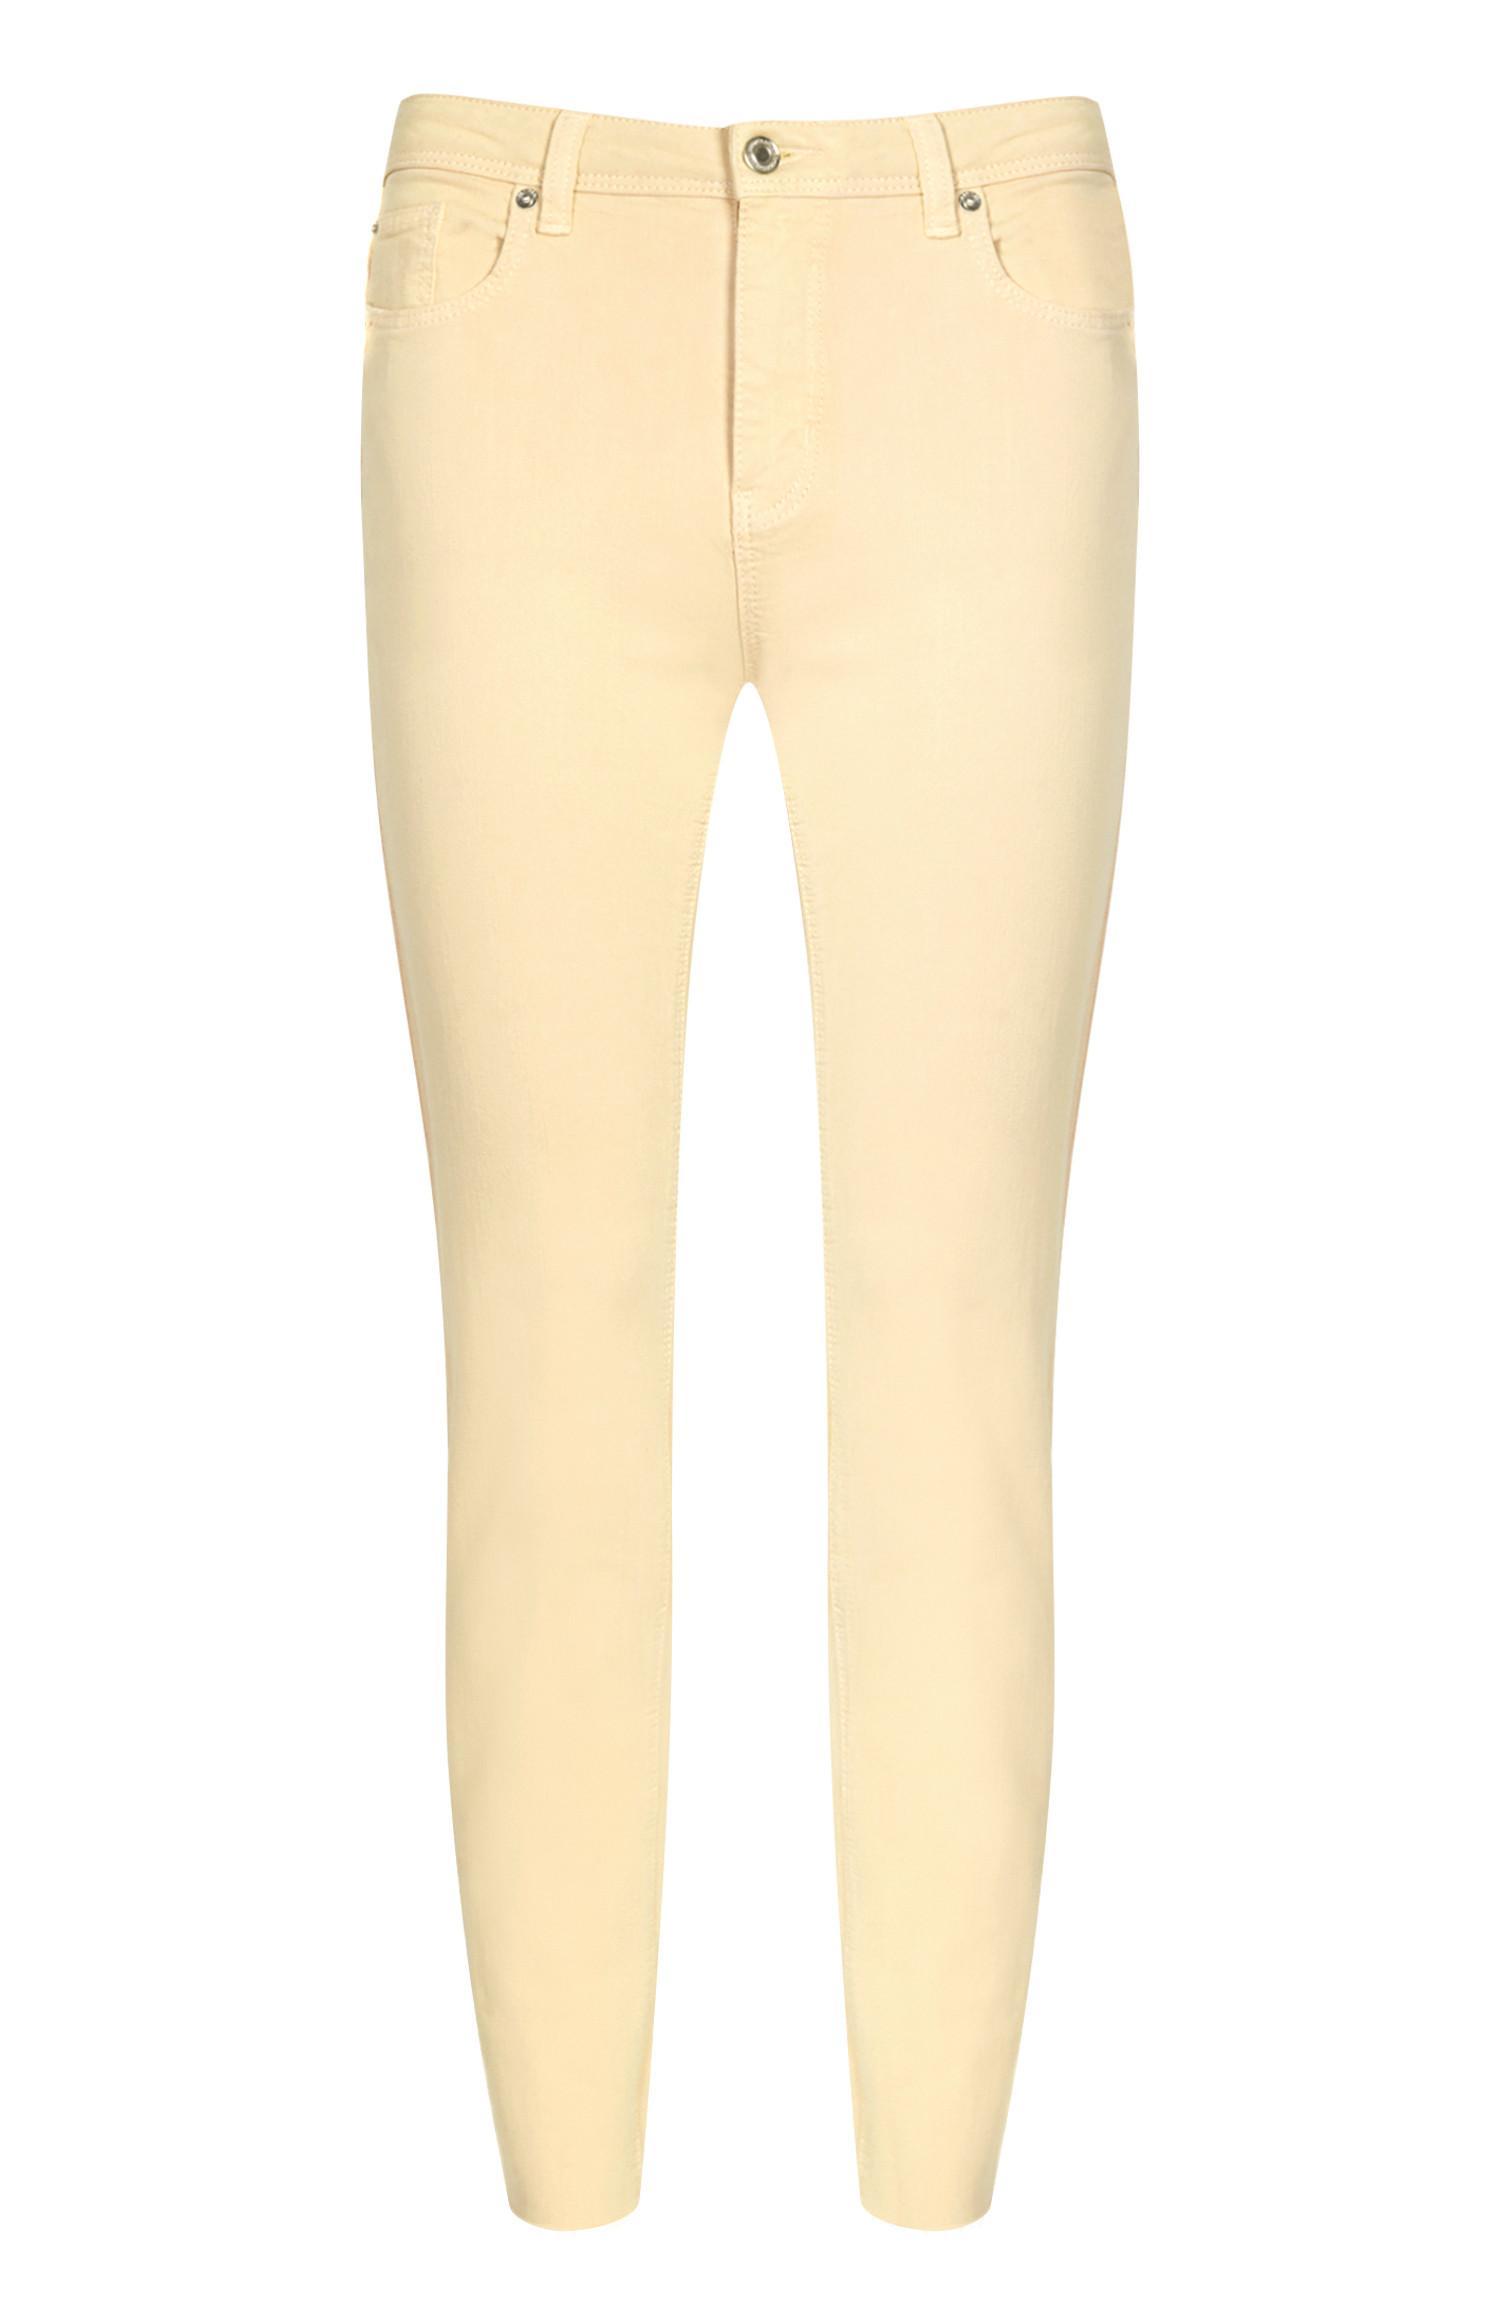 Yellow Skinny Jean